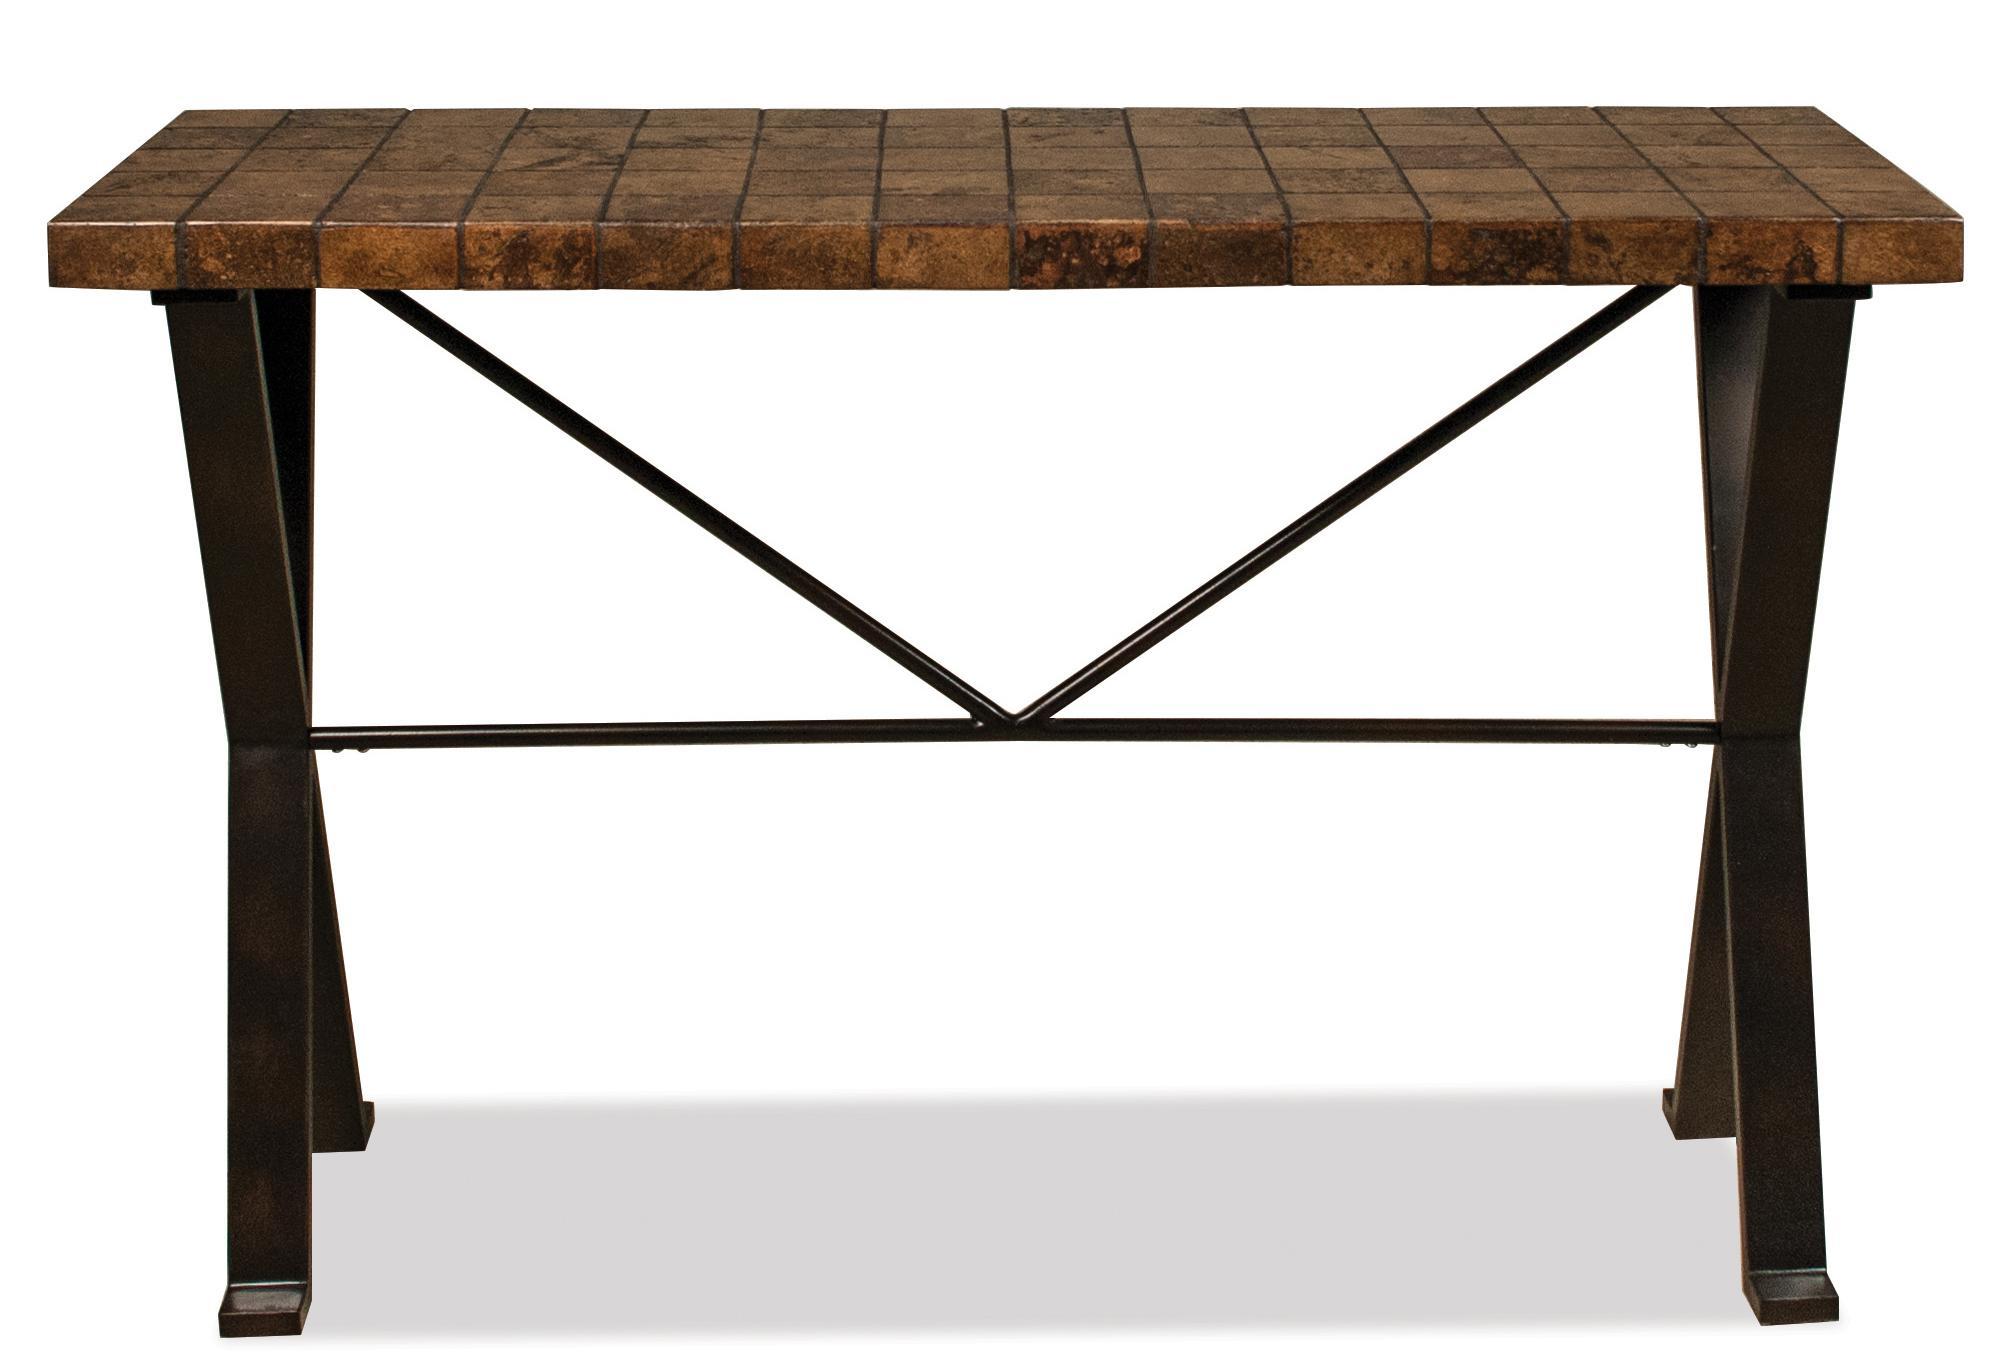 Riverside Furniture Bolero Sofa Table            - Item Number: 91815